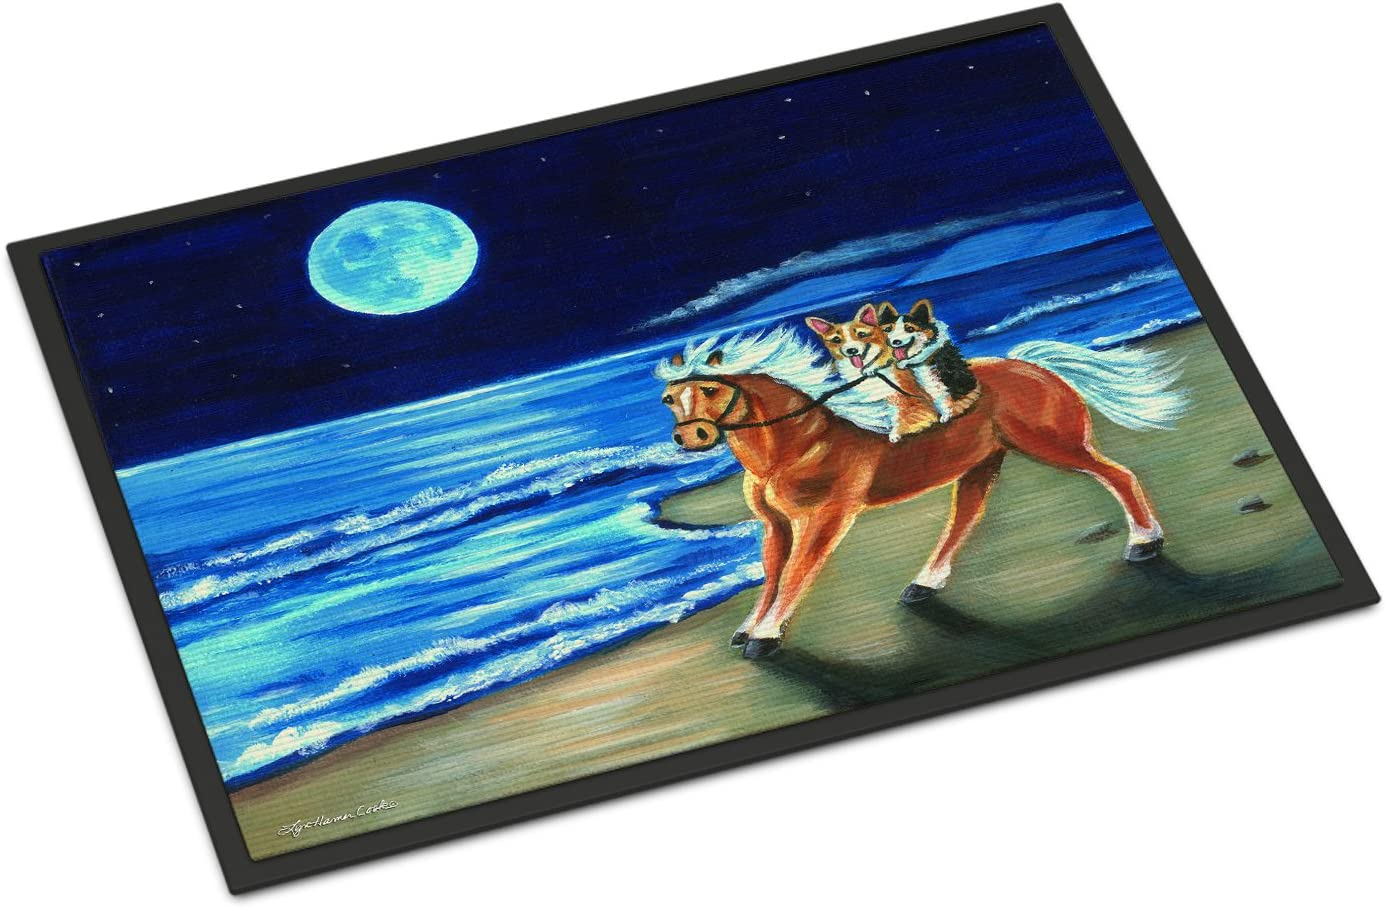 Caroline's Miami Mall Treasures 7318JMAT Max 74% OFF Corgi Beach o Ride Horse on Indoor